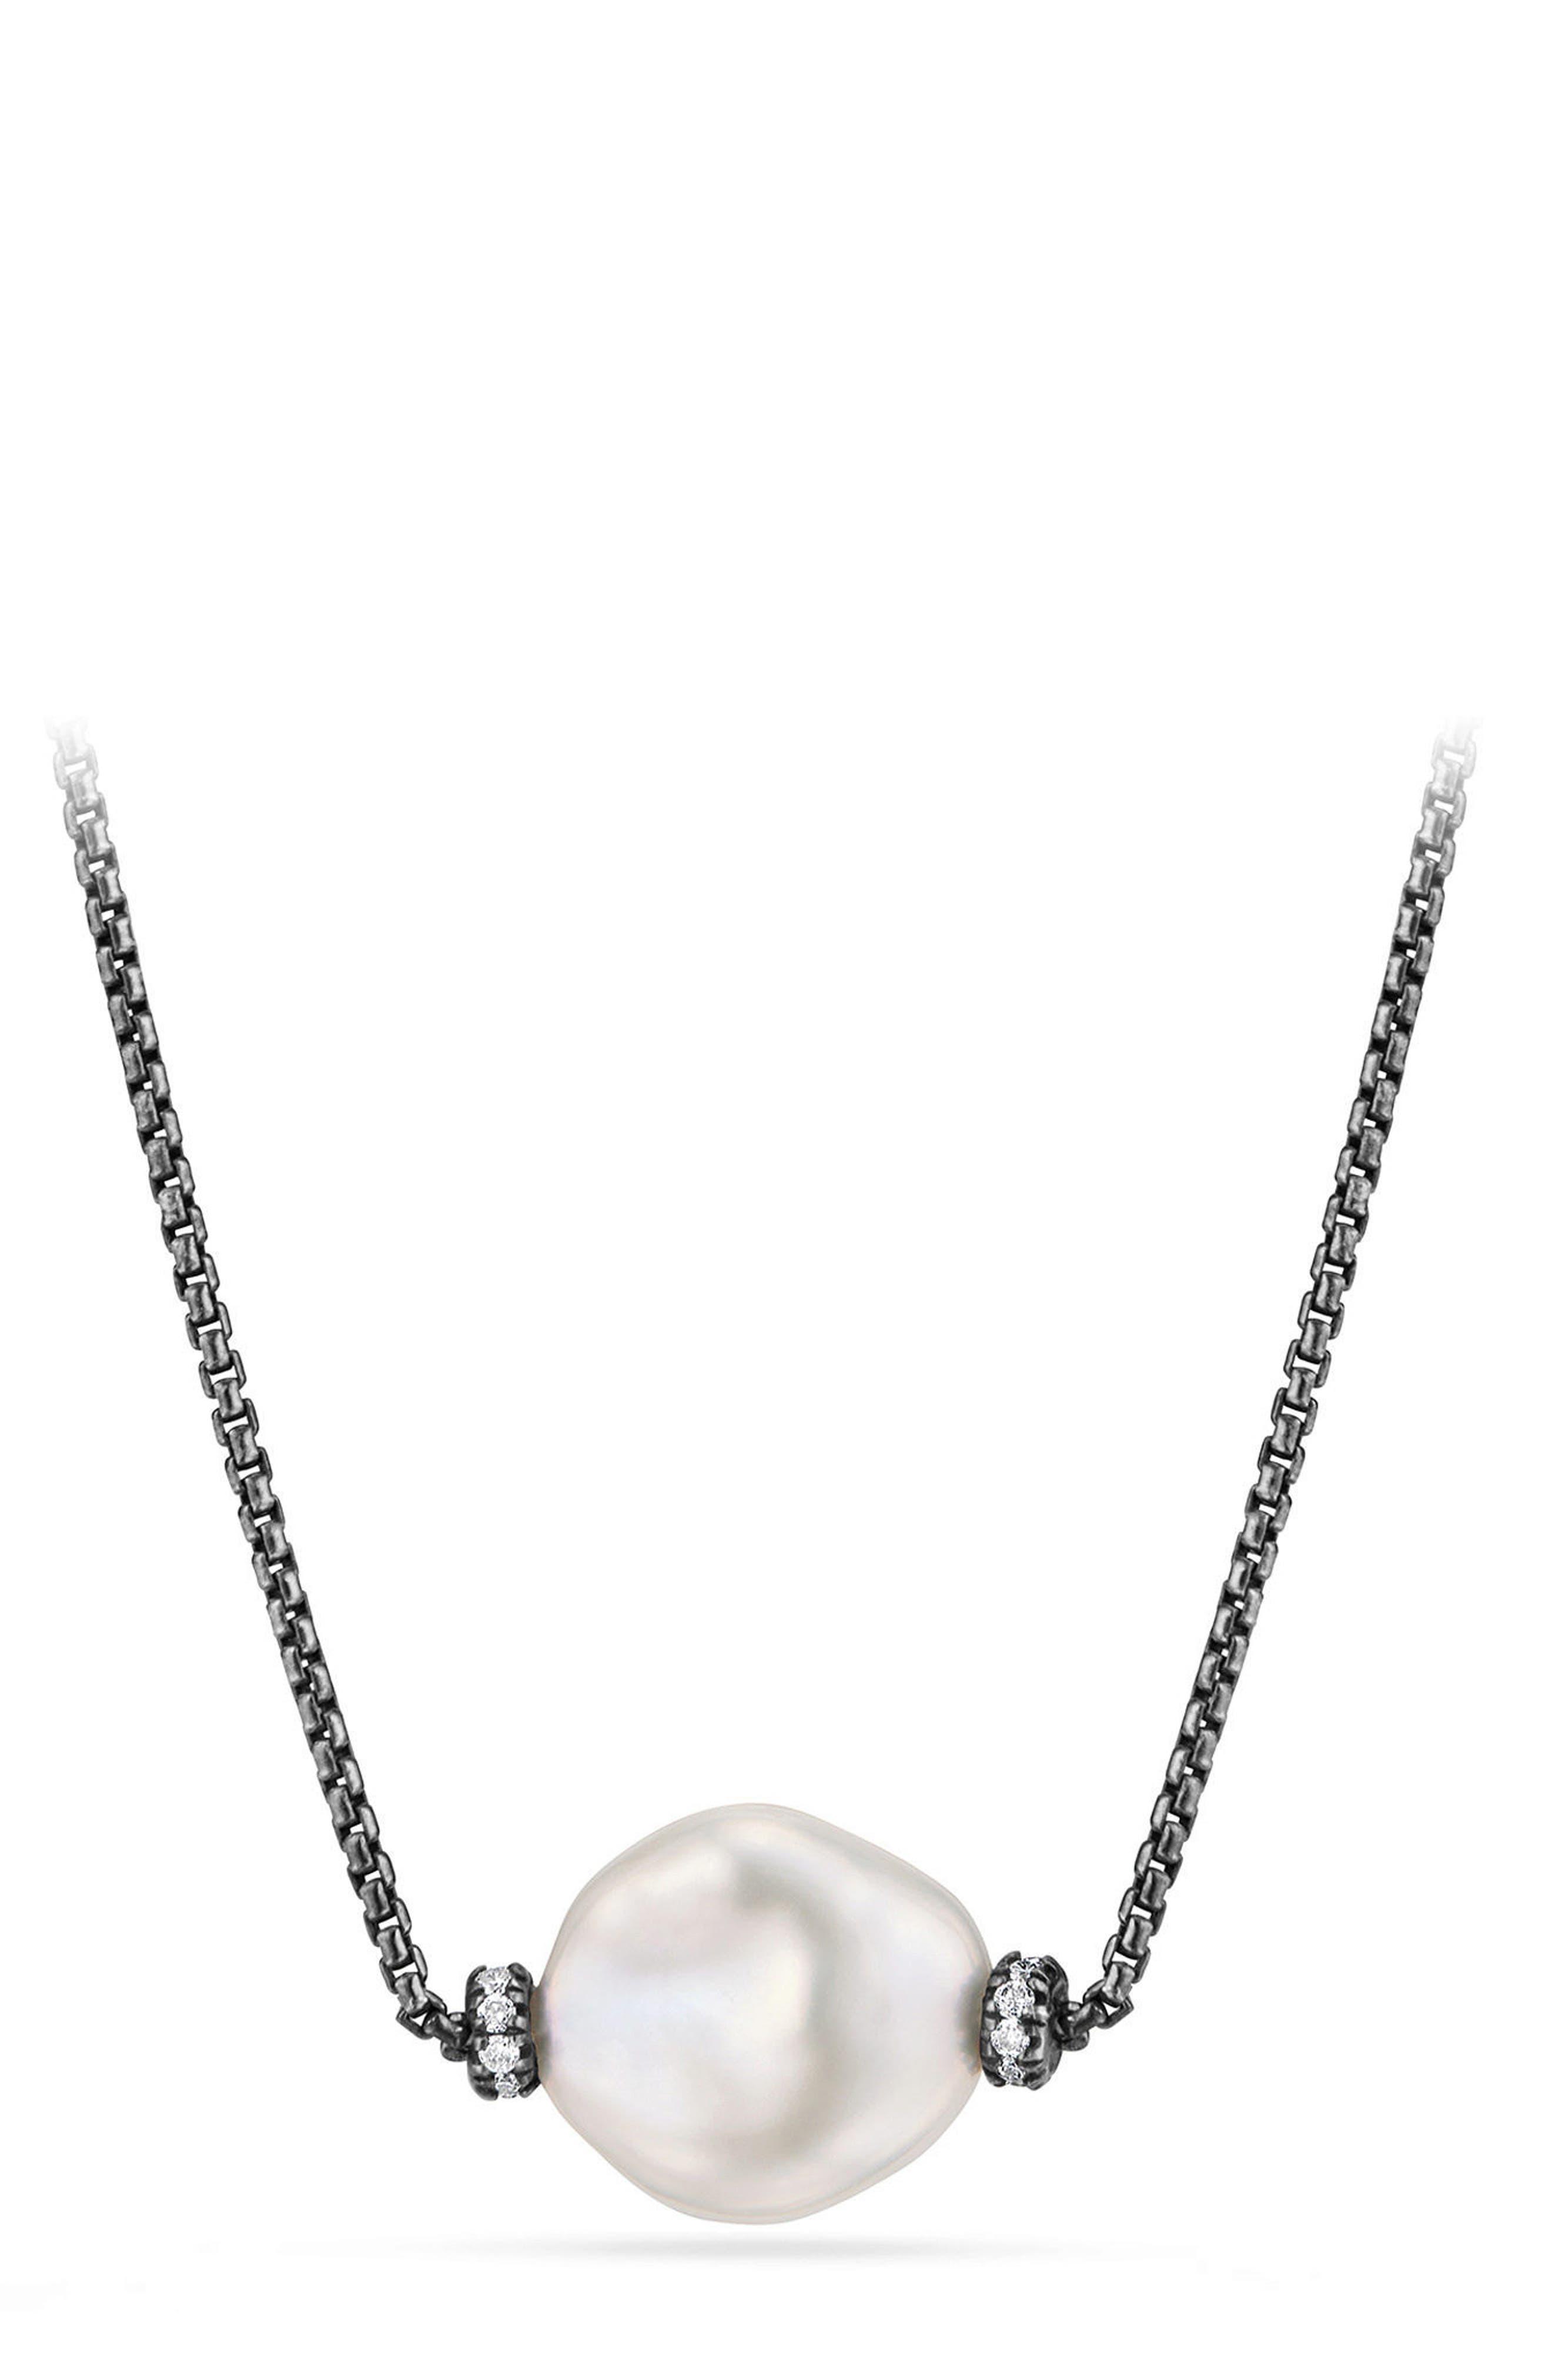 Solari Pearl & Diamond Station Necklace,                             Main thumbnail 1, color,                             SILVER/ PEARL